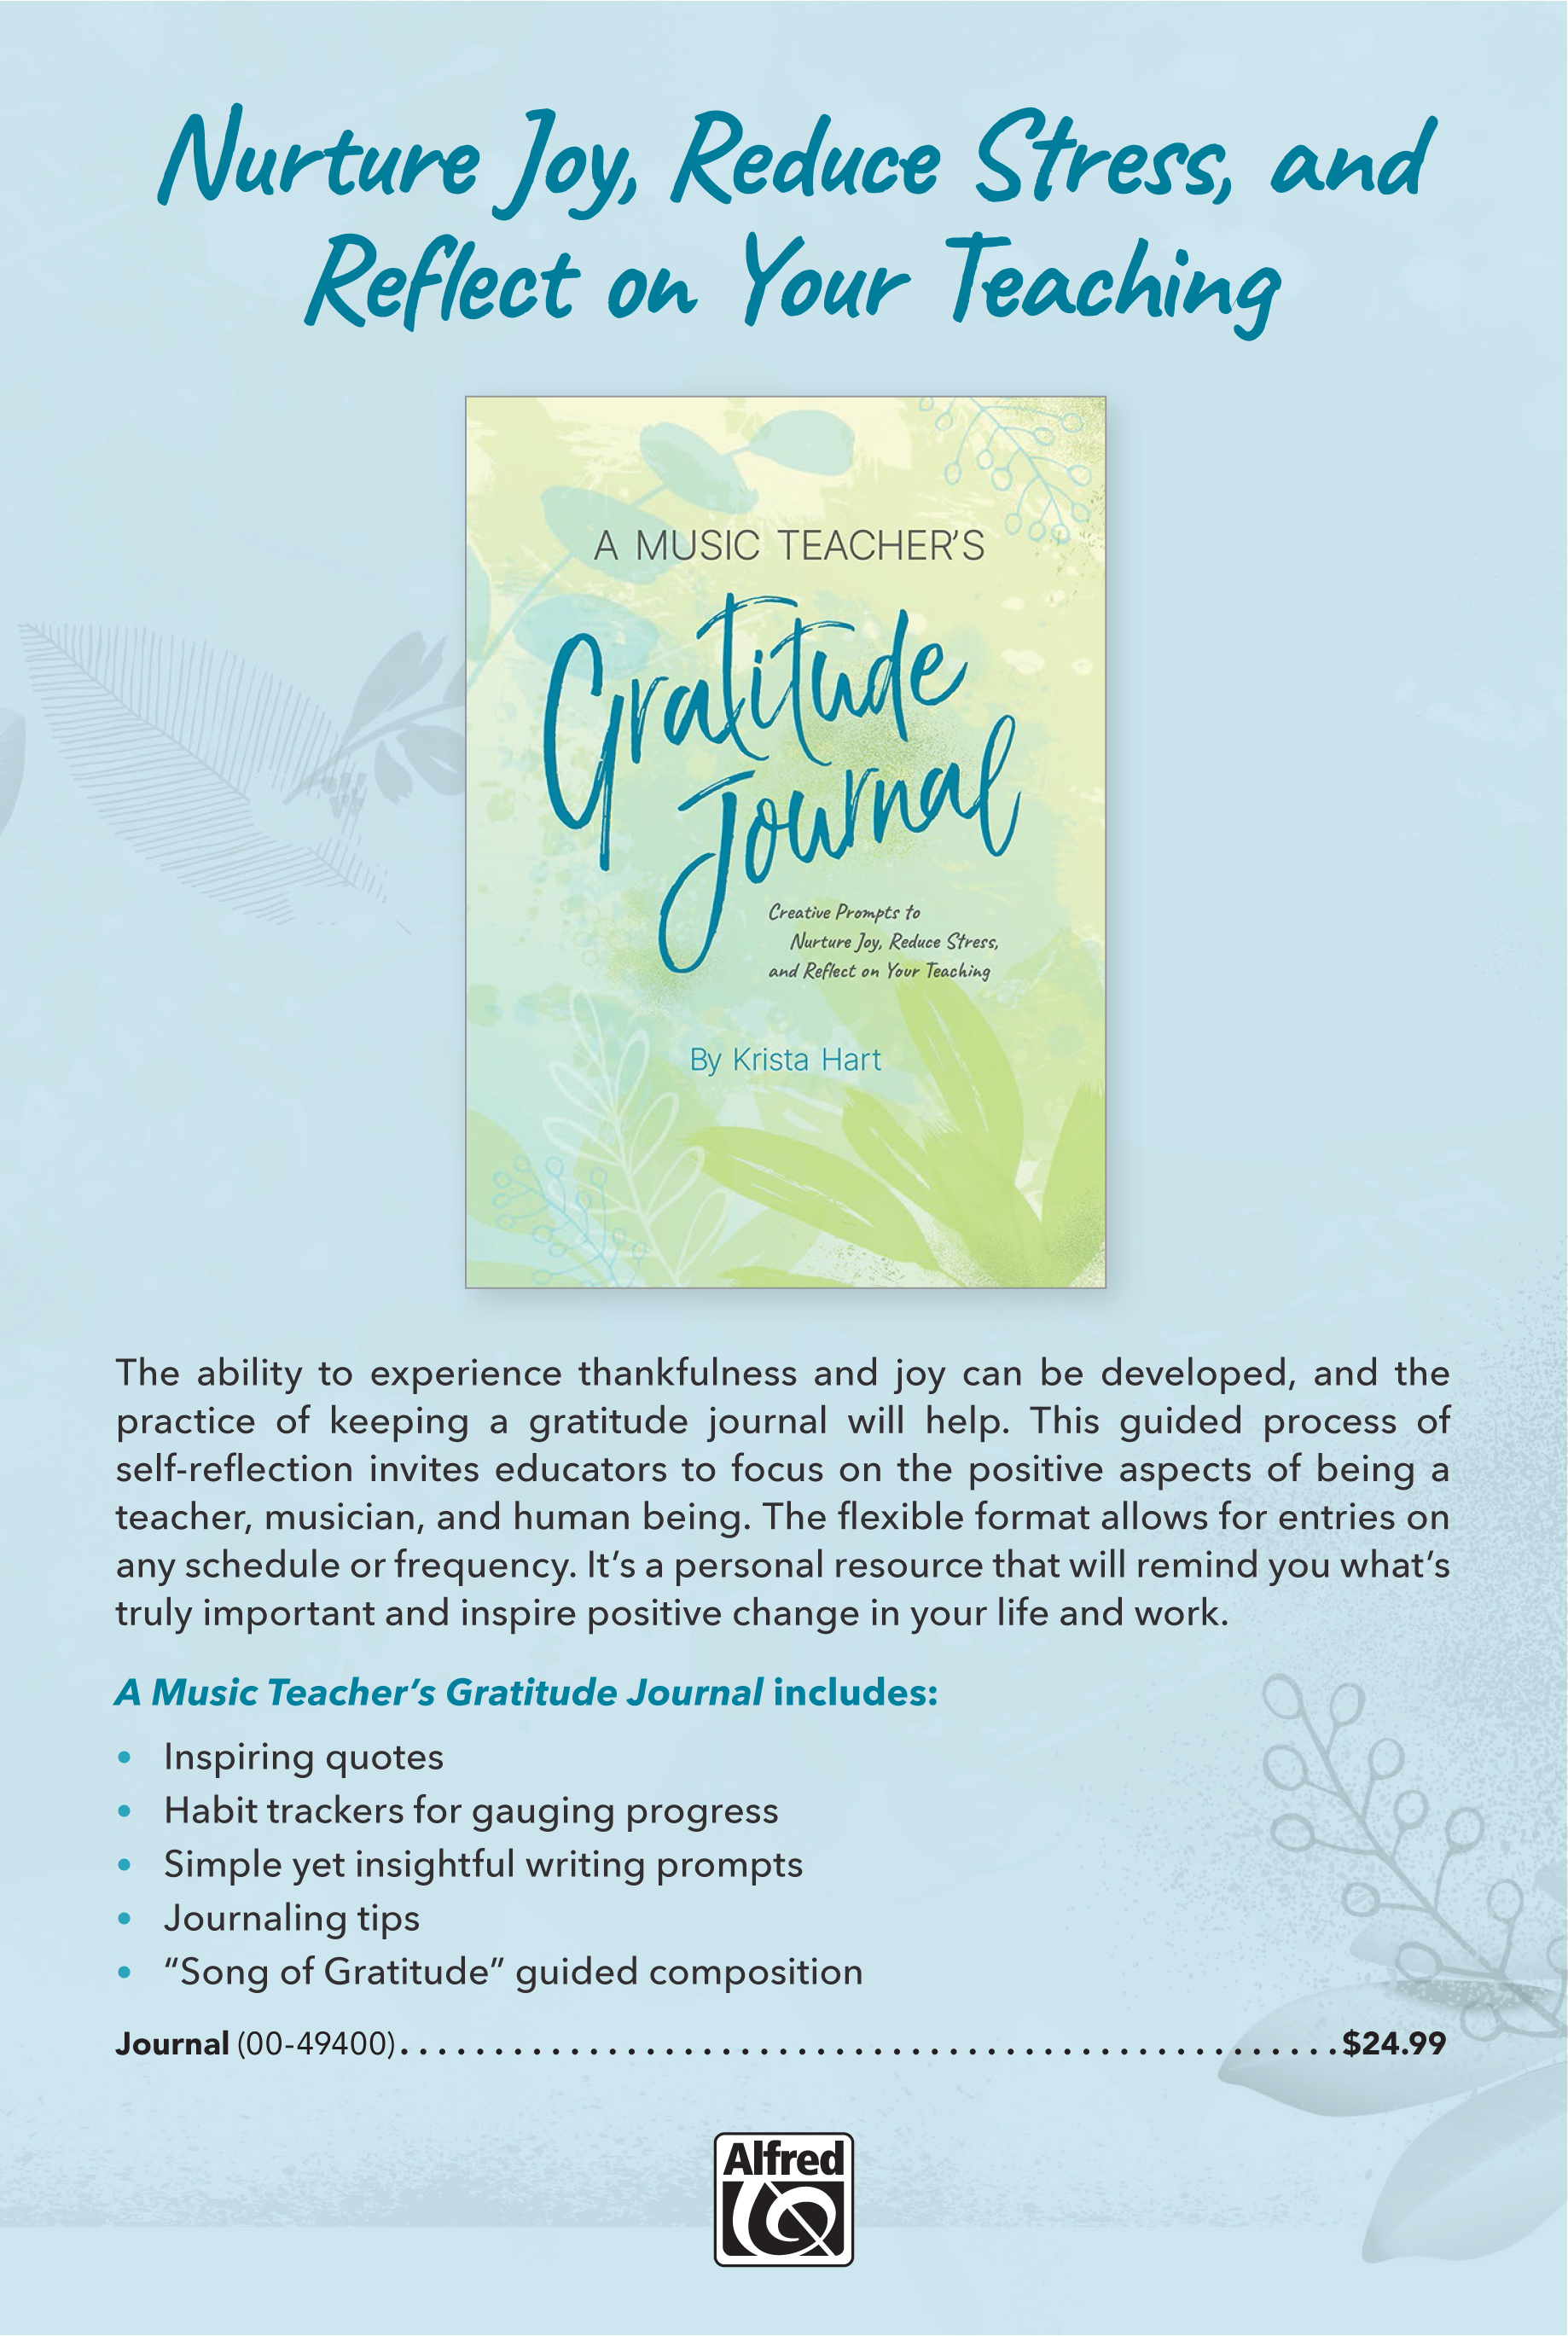 The Music Teacher's Gratitude Journal